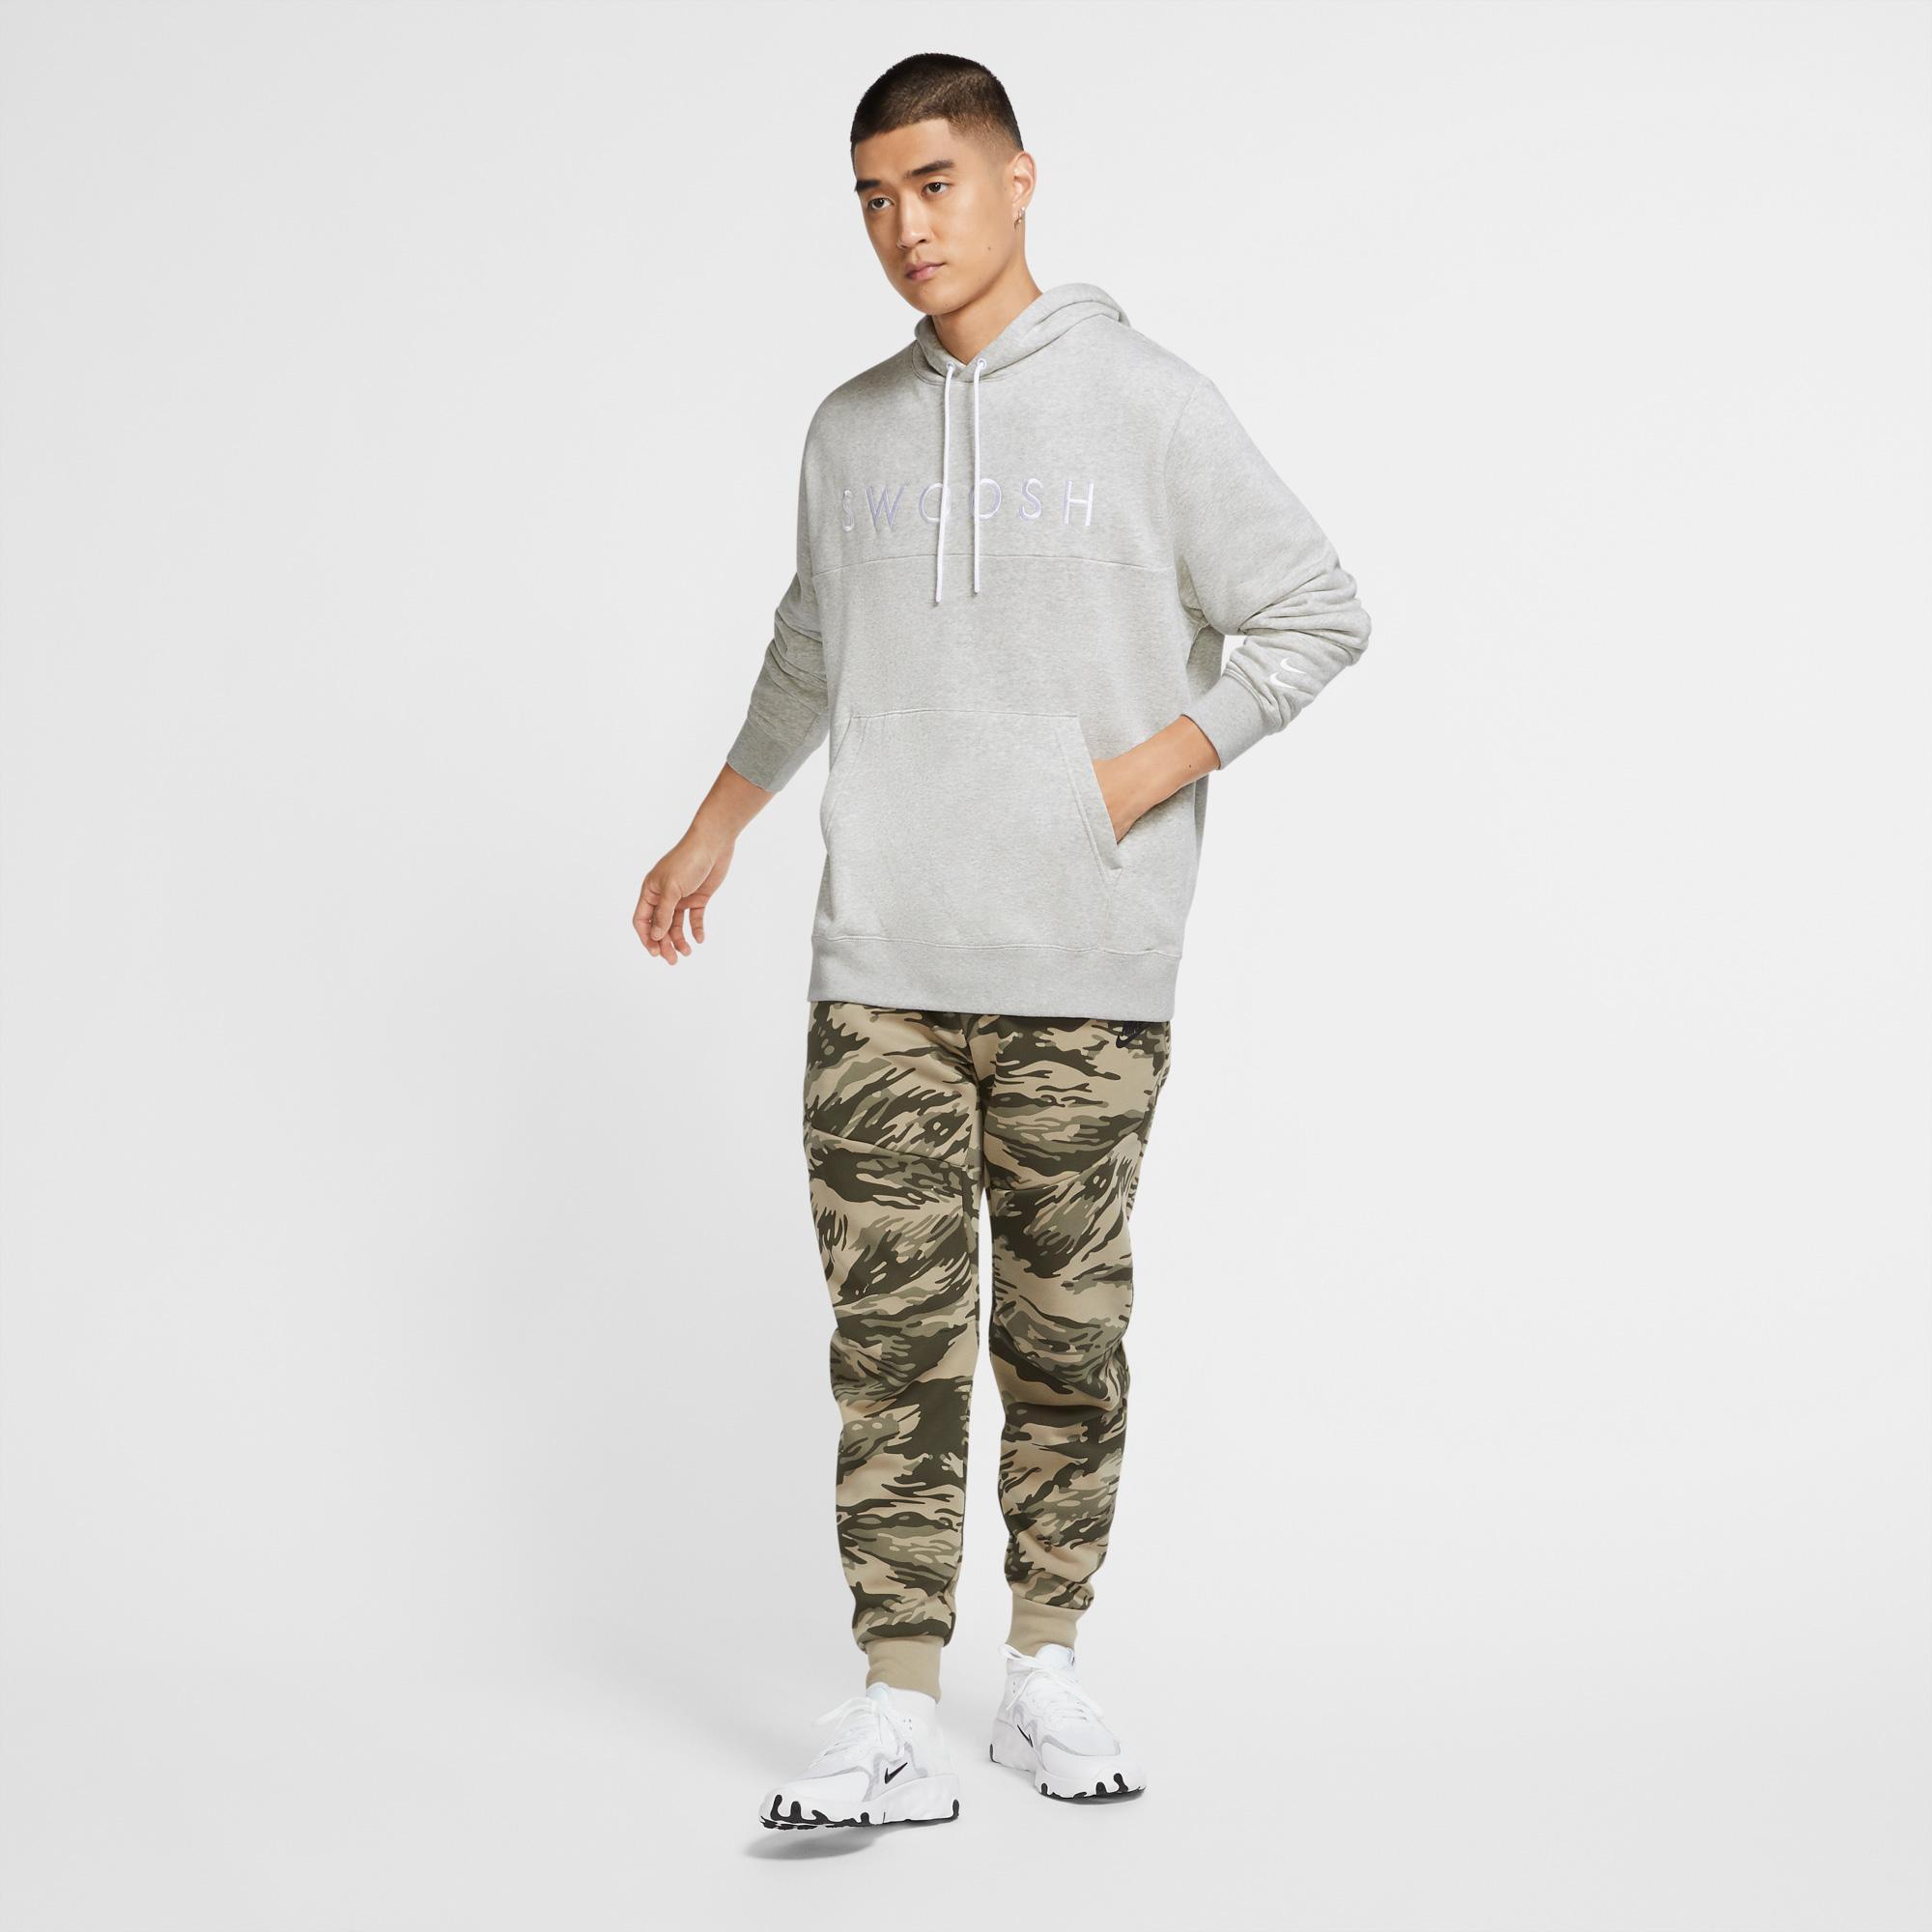 Nike Sportswear Swoosh Erkek Gri Sweatshirt